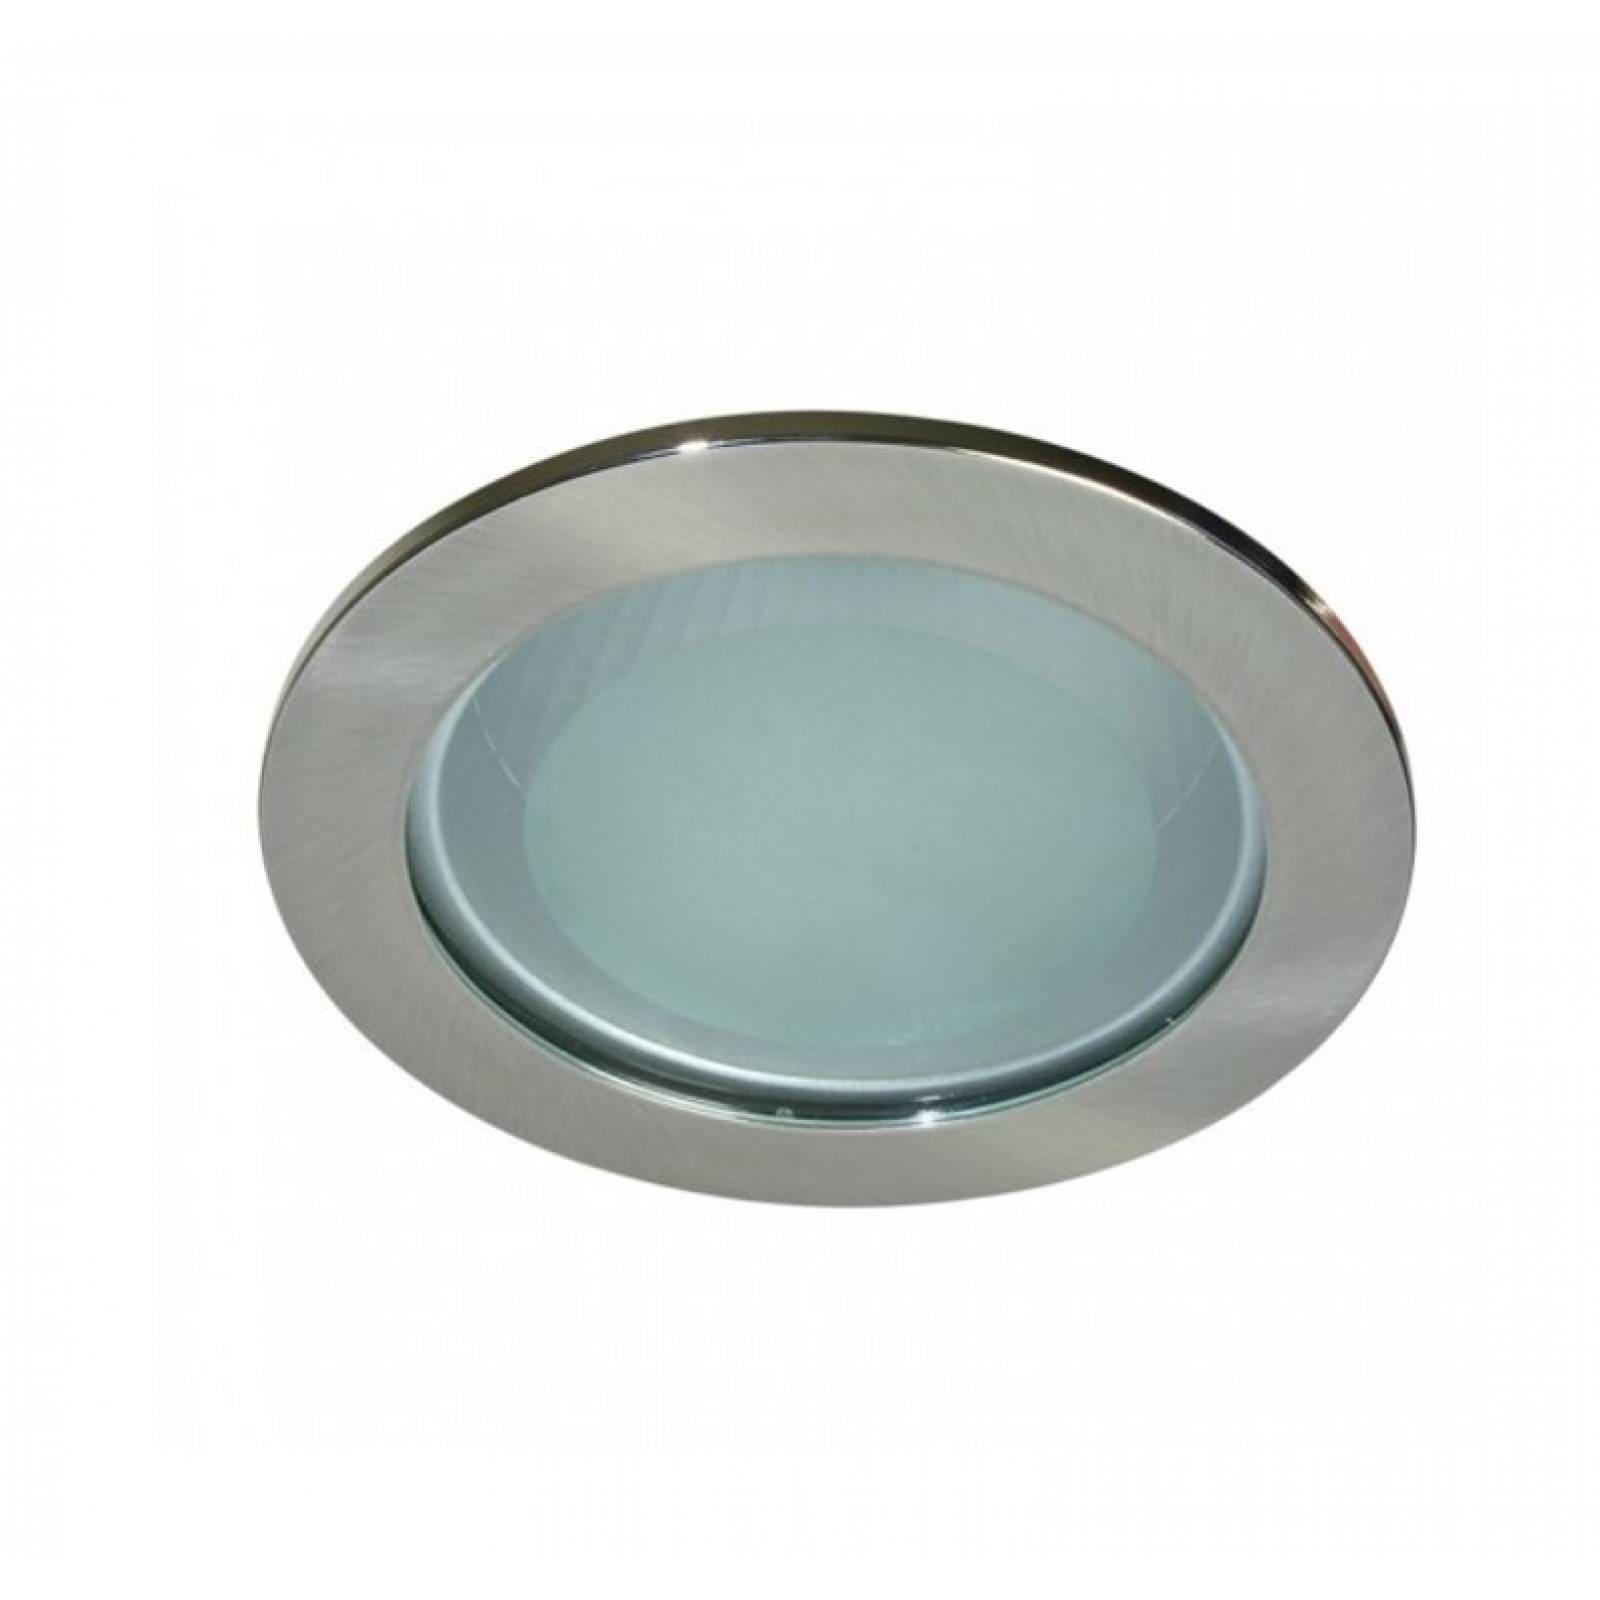 Lampara De Techo Empotrado Grande Con Cristal E27 Gris Calux